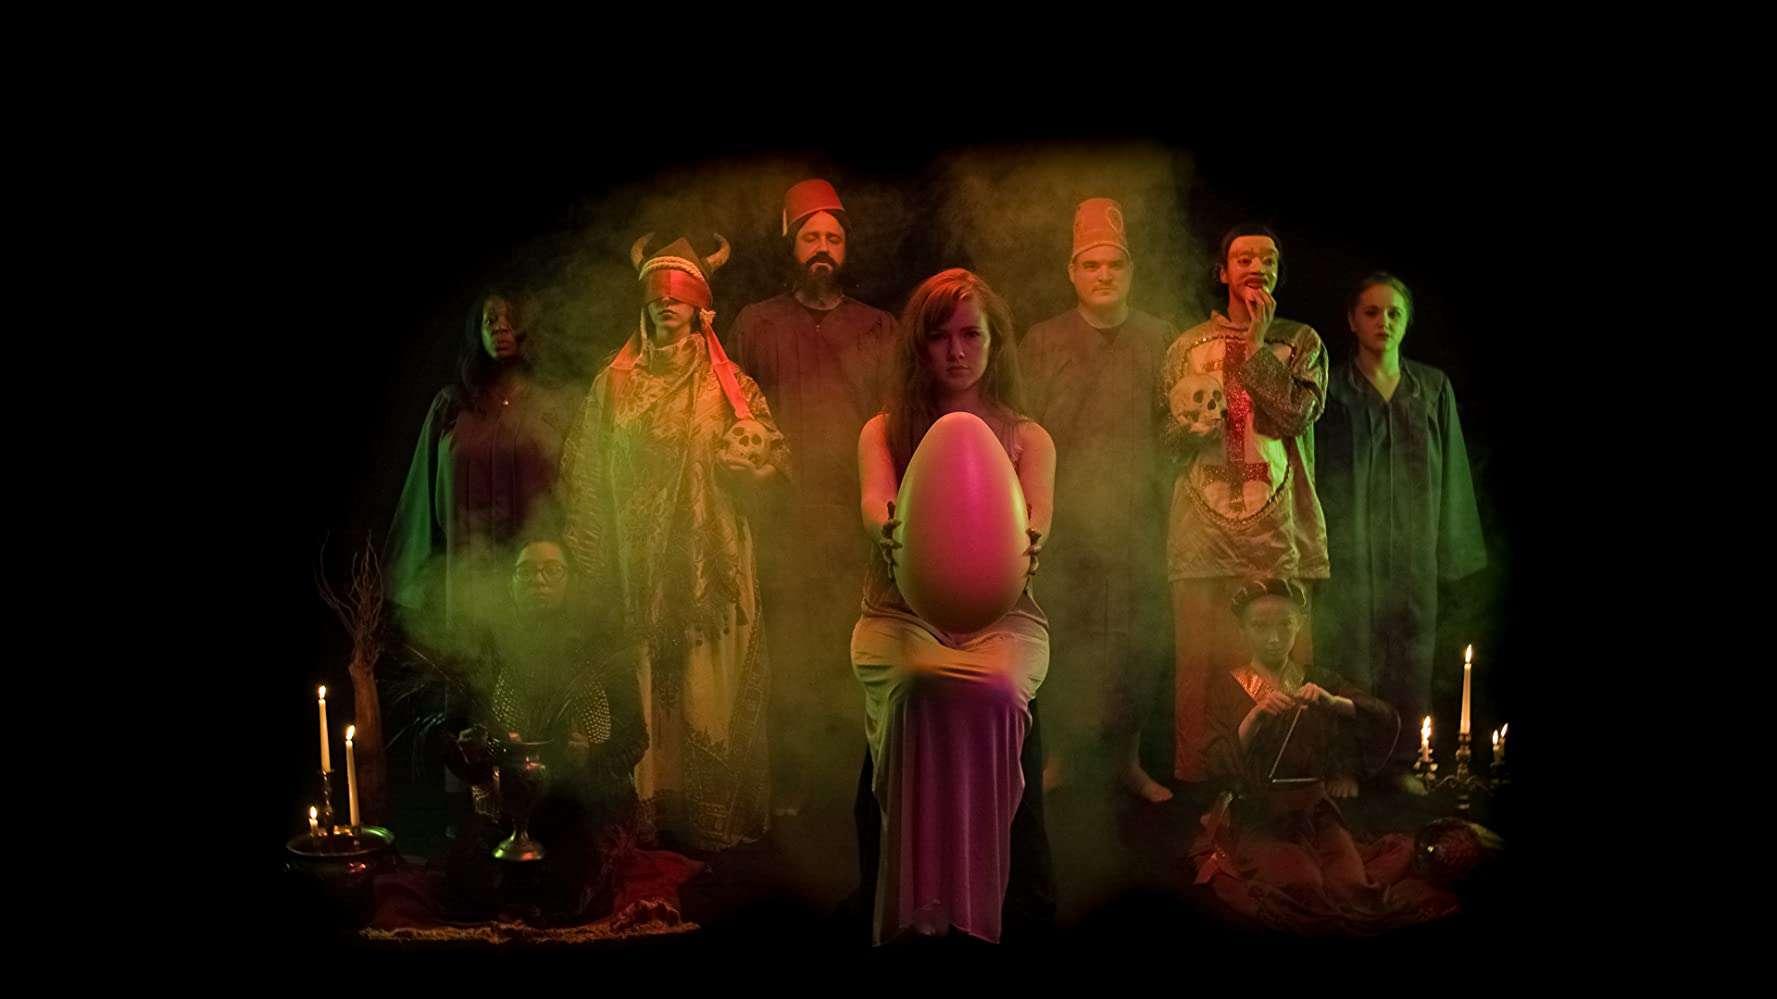 Joseph's Review: Sister Tempest (NOLA Horror Film Fest)